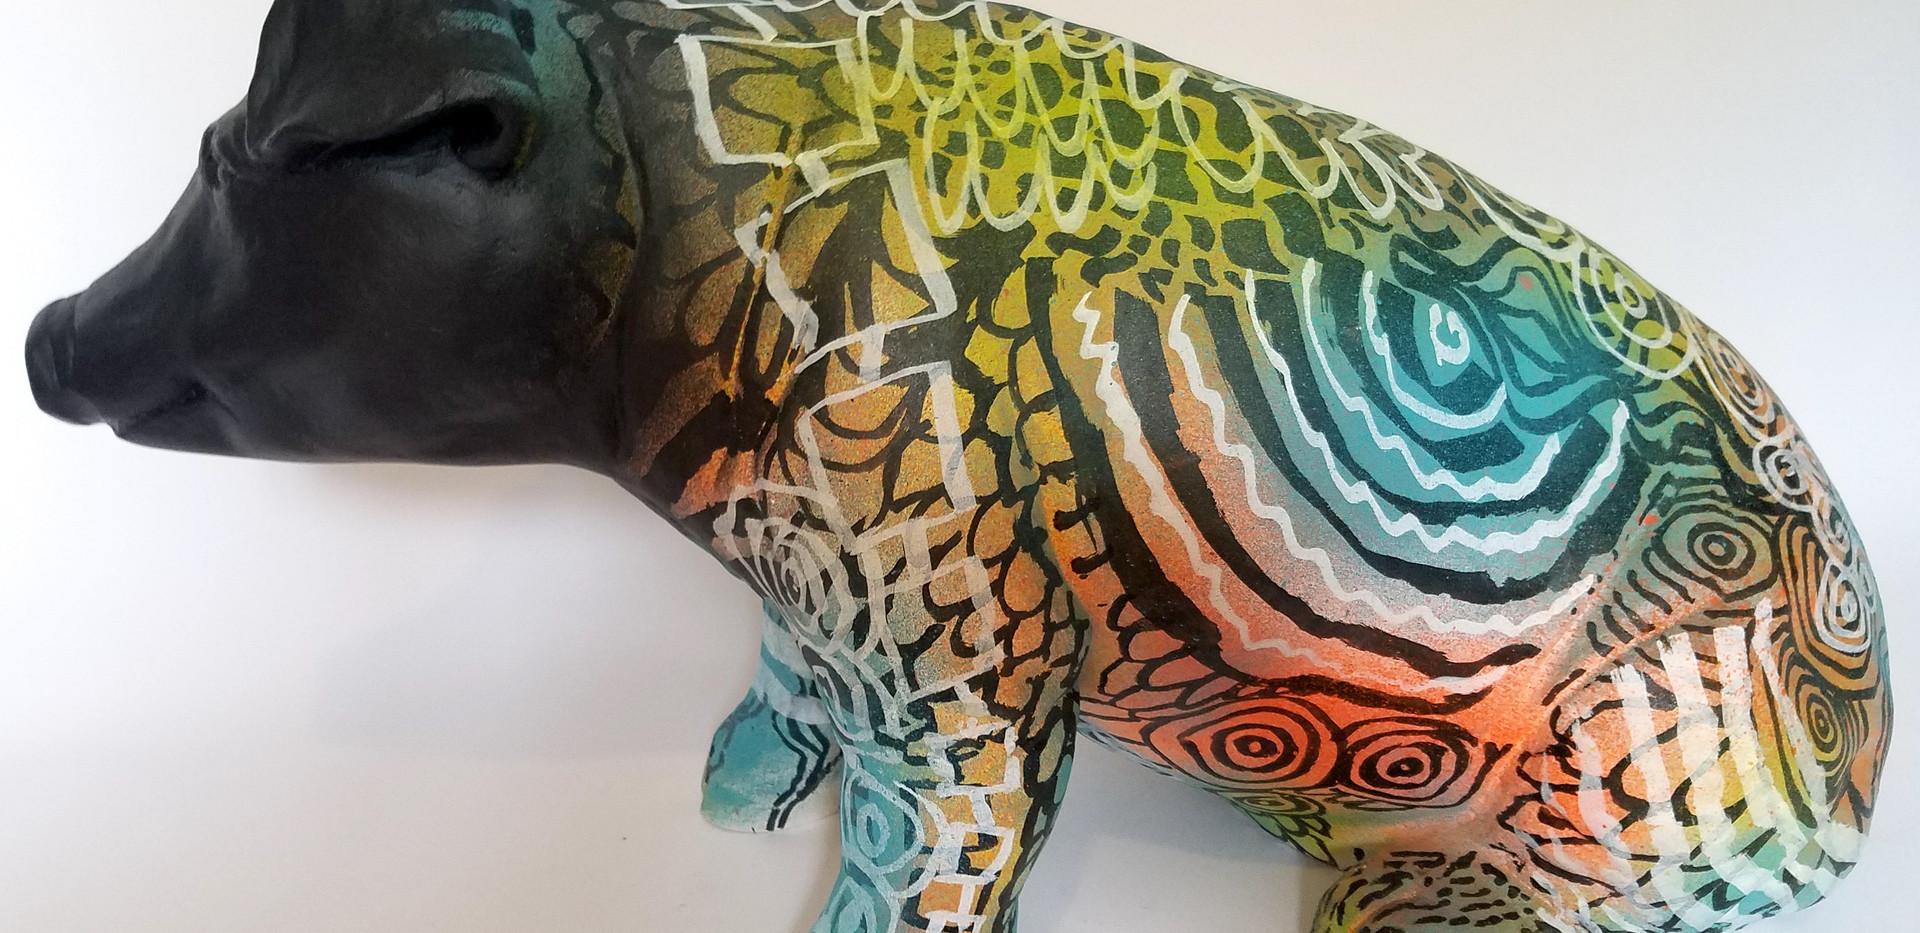 Jason O'Malley  Graffiti Pig by Rural Modernist